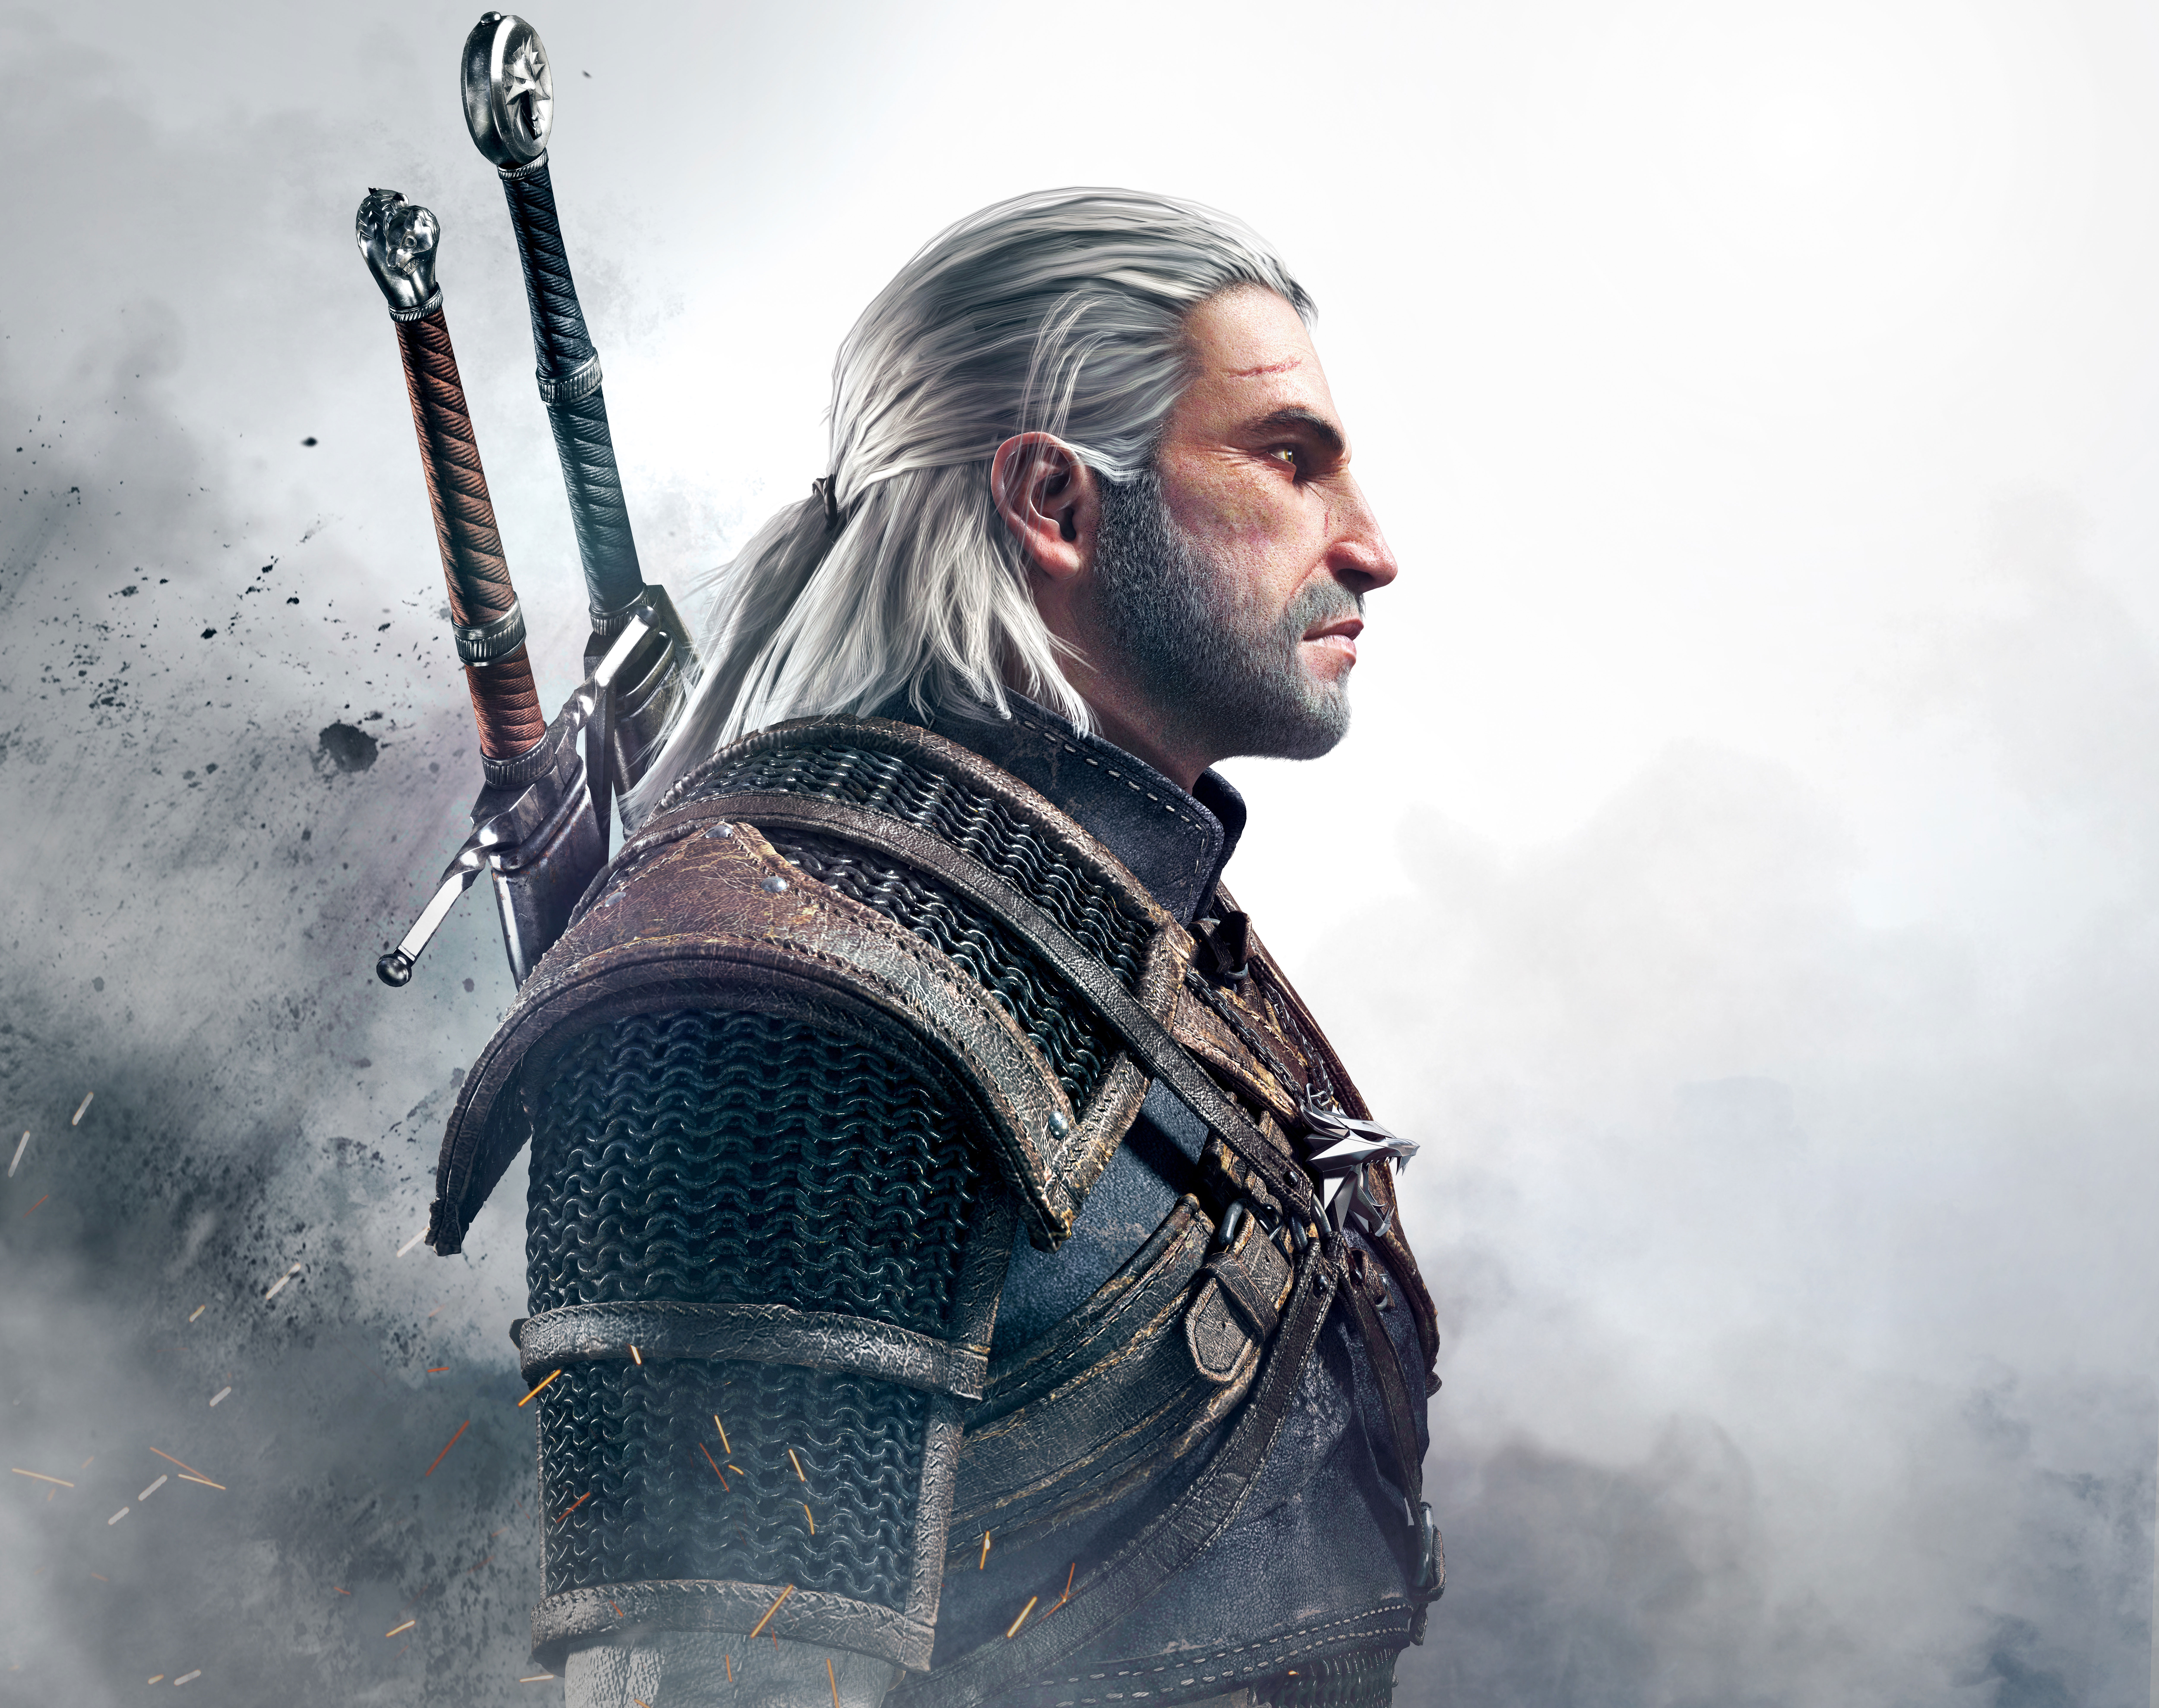 The Witcher 3 Wallpaper 4k: Geralt Of Rivia 10k, HD Games, 4k Wallpapers, Images